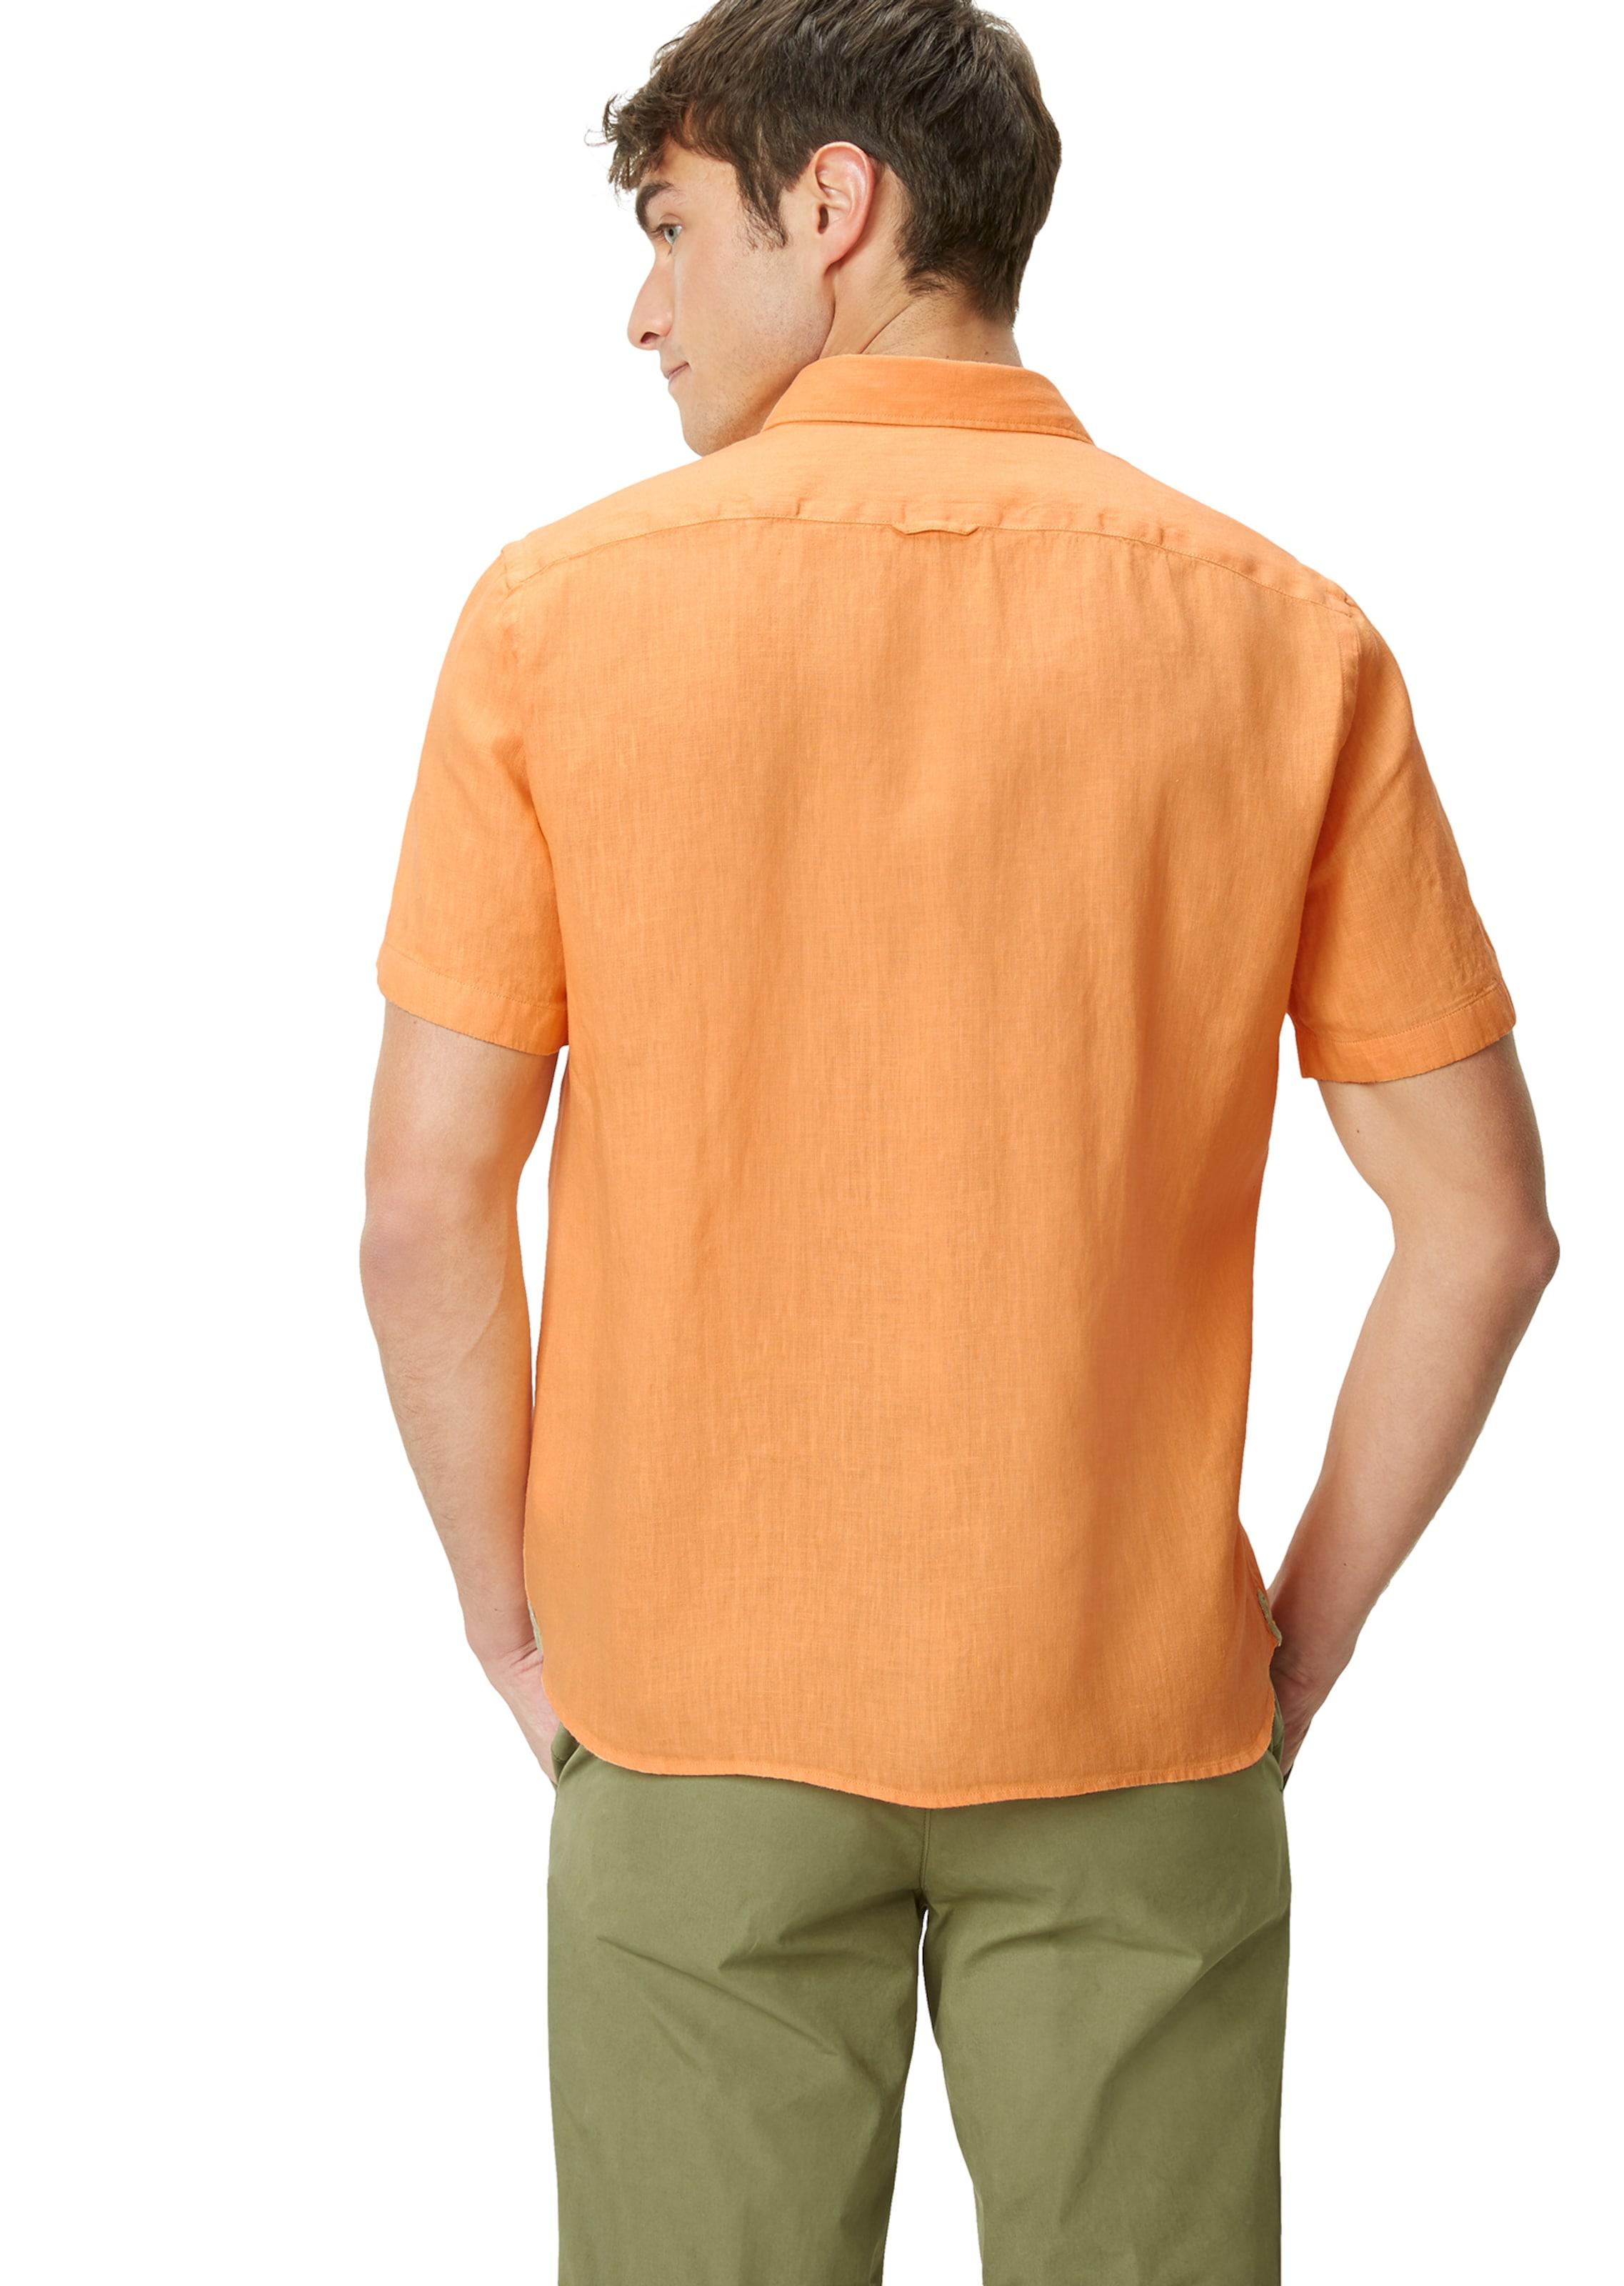 O'polo Marc Kurzarm In hemd Orange tQshrCdx